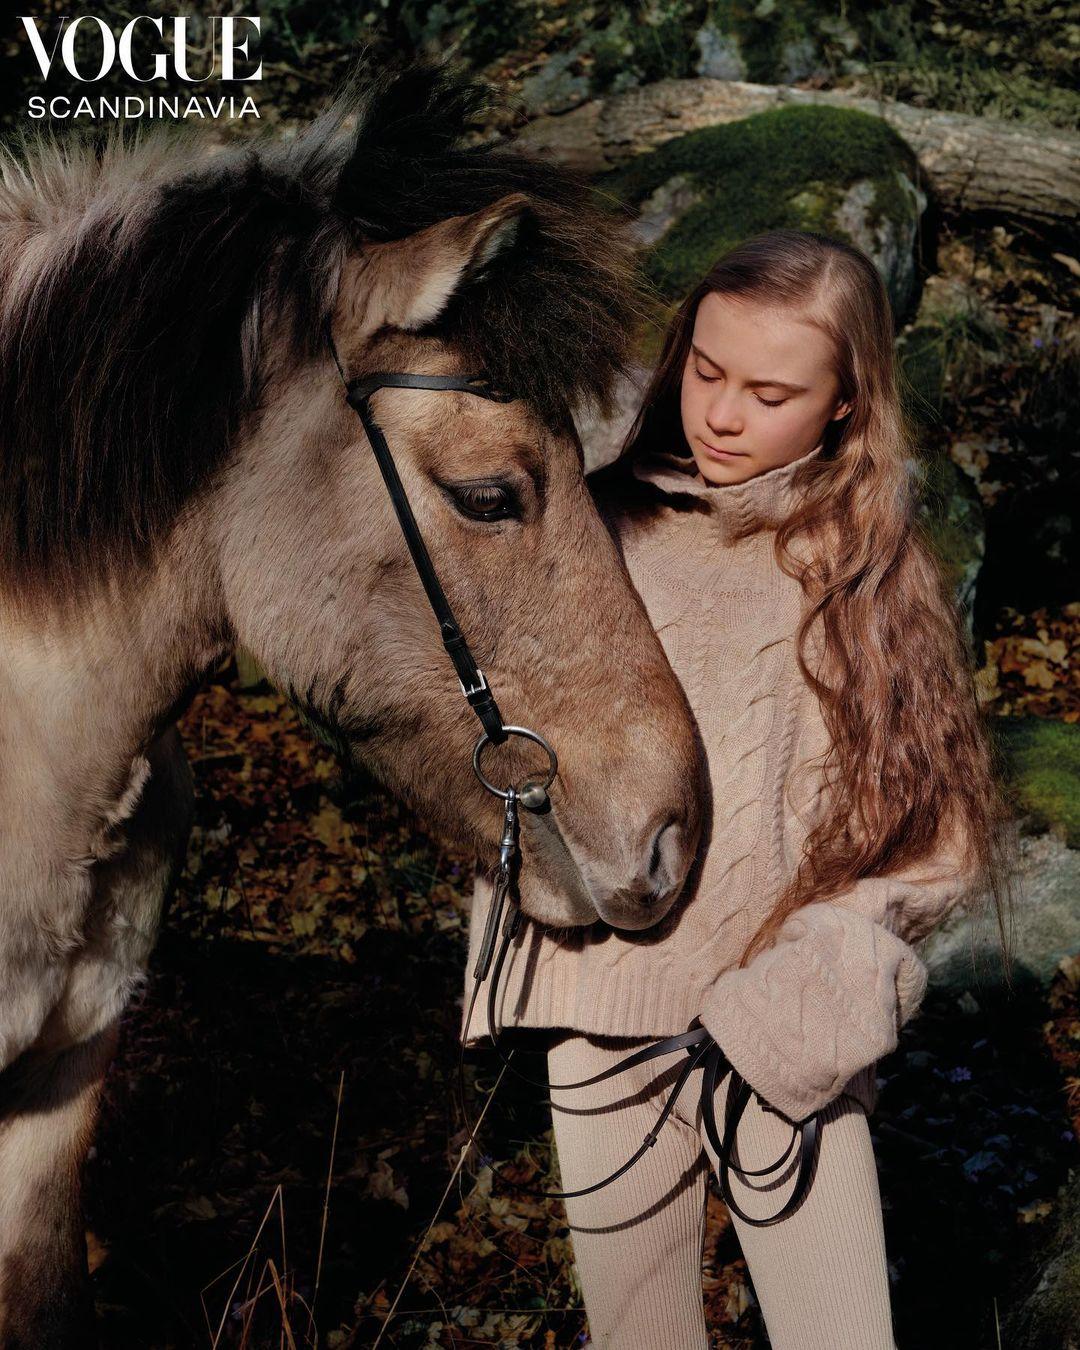 Грета Тунберг знялася для обкладинки Vogue